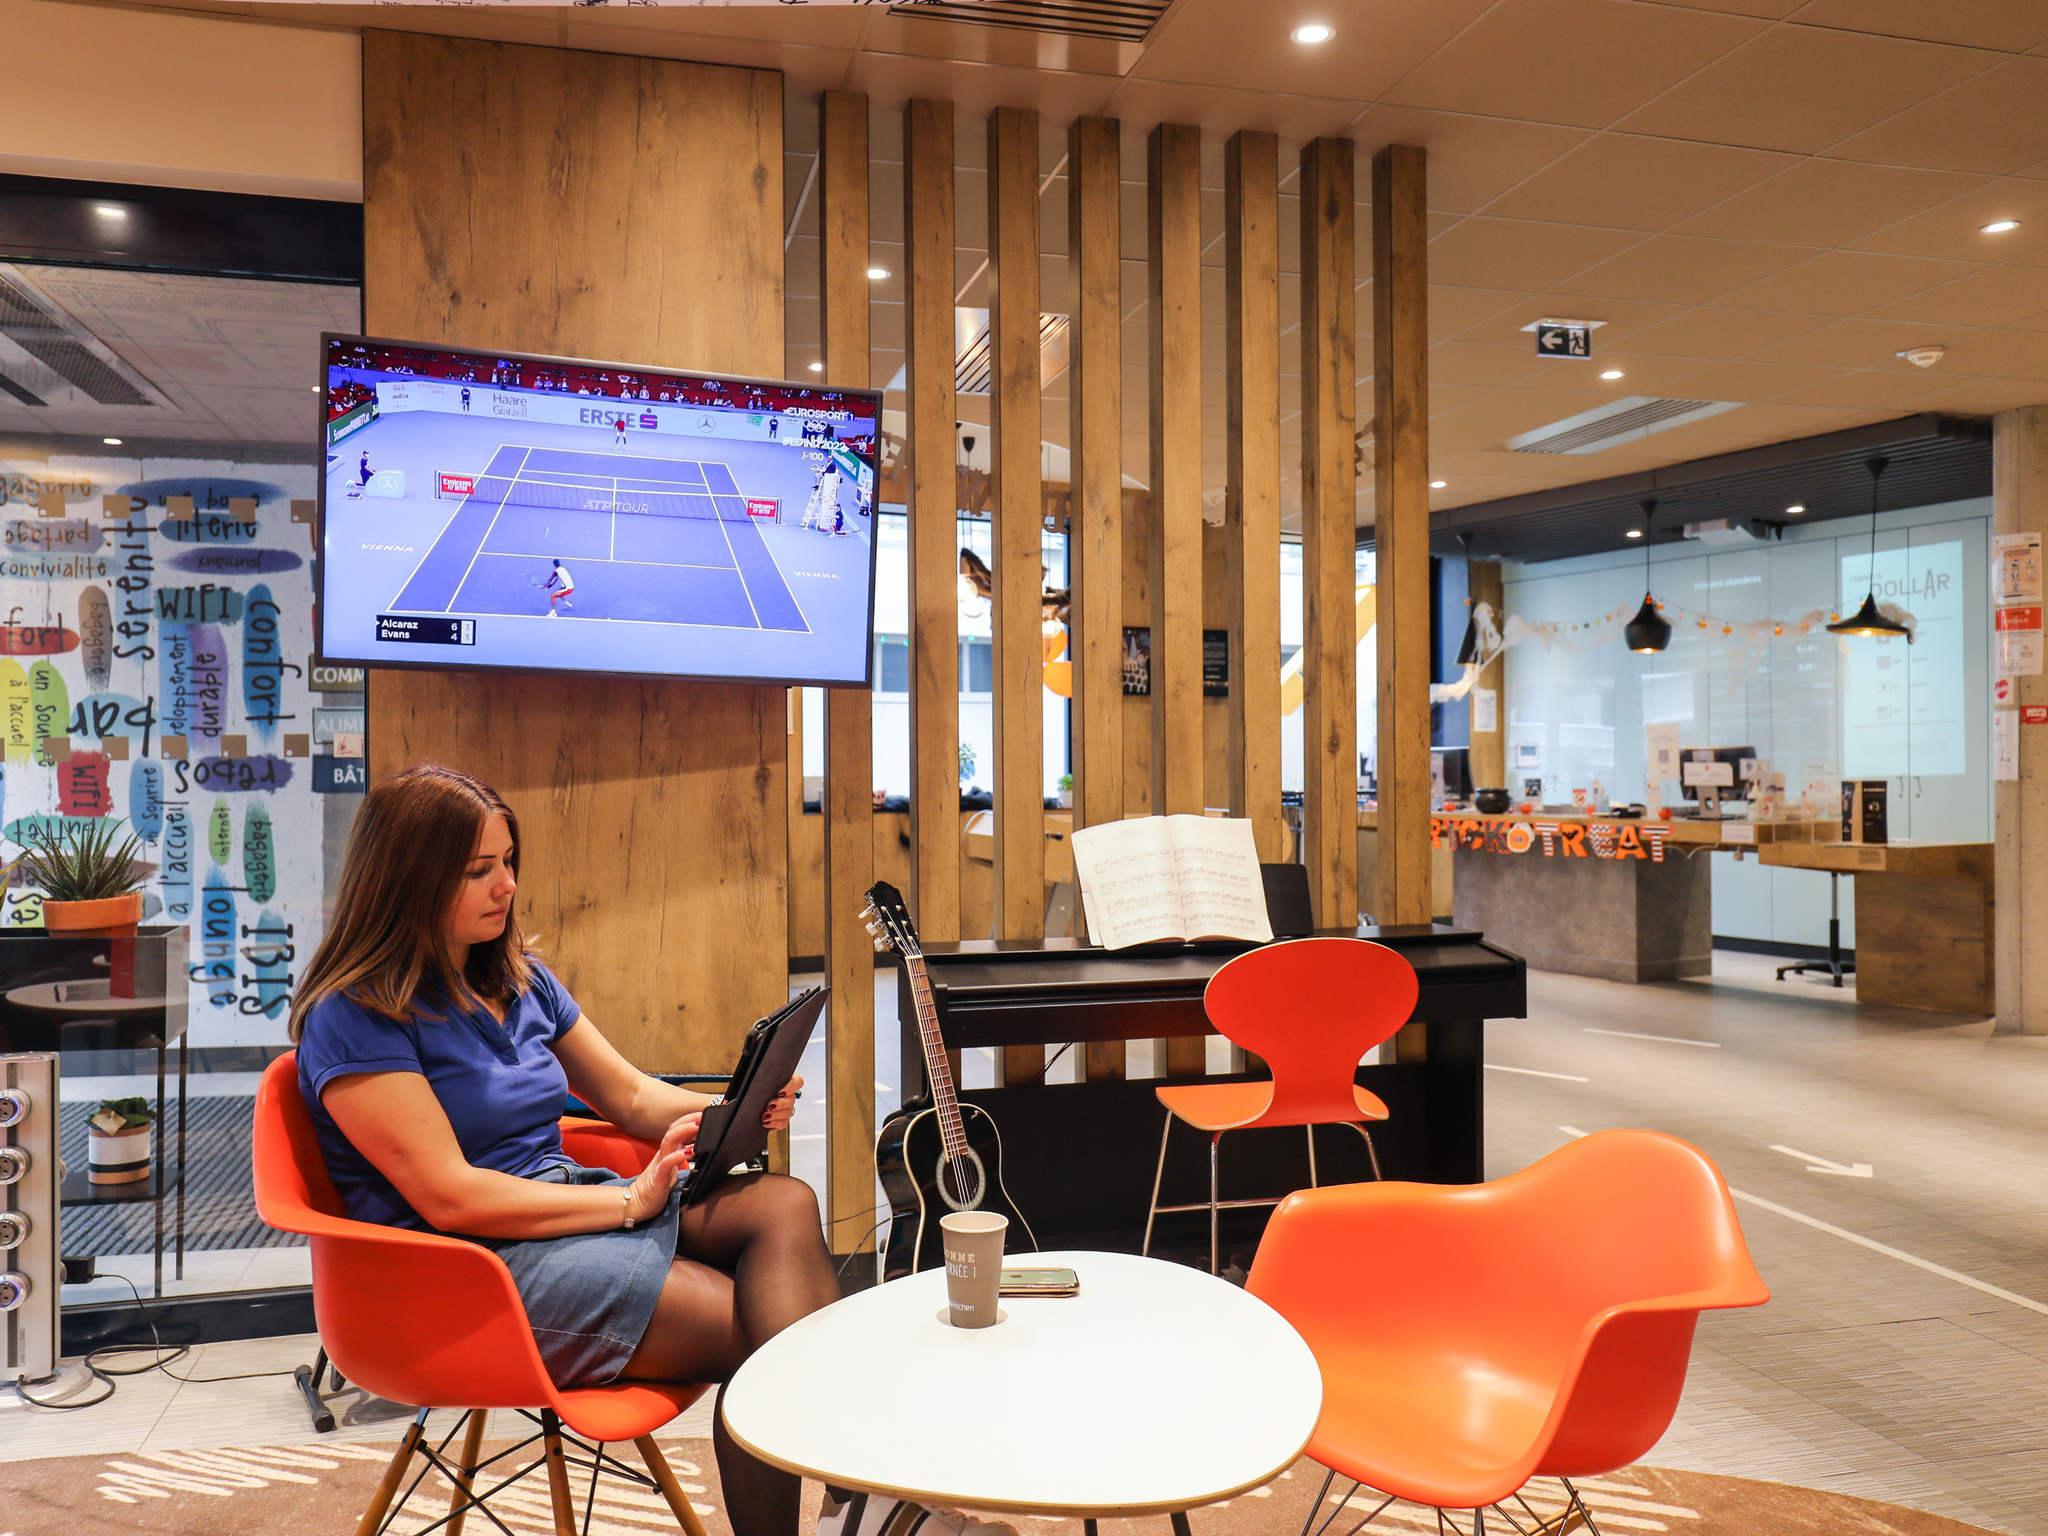 Gallery of hotel ibis saint germain en laye centre with for Piscine saint germain en laye salle de sport